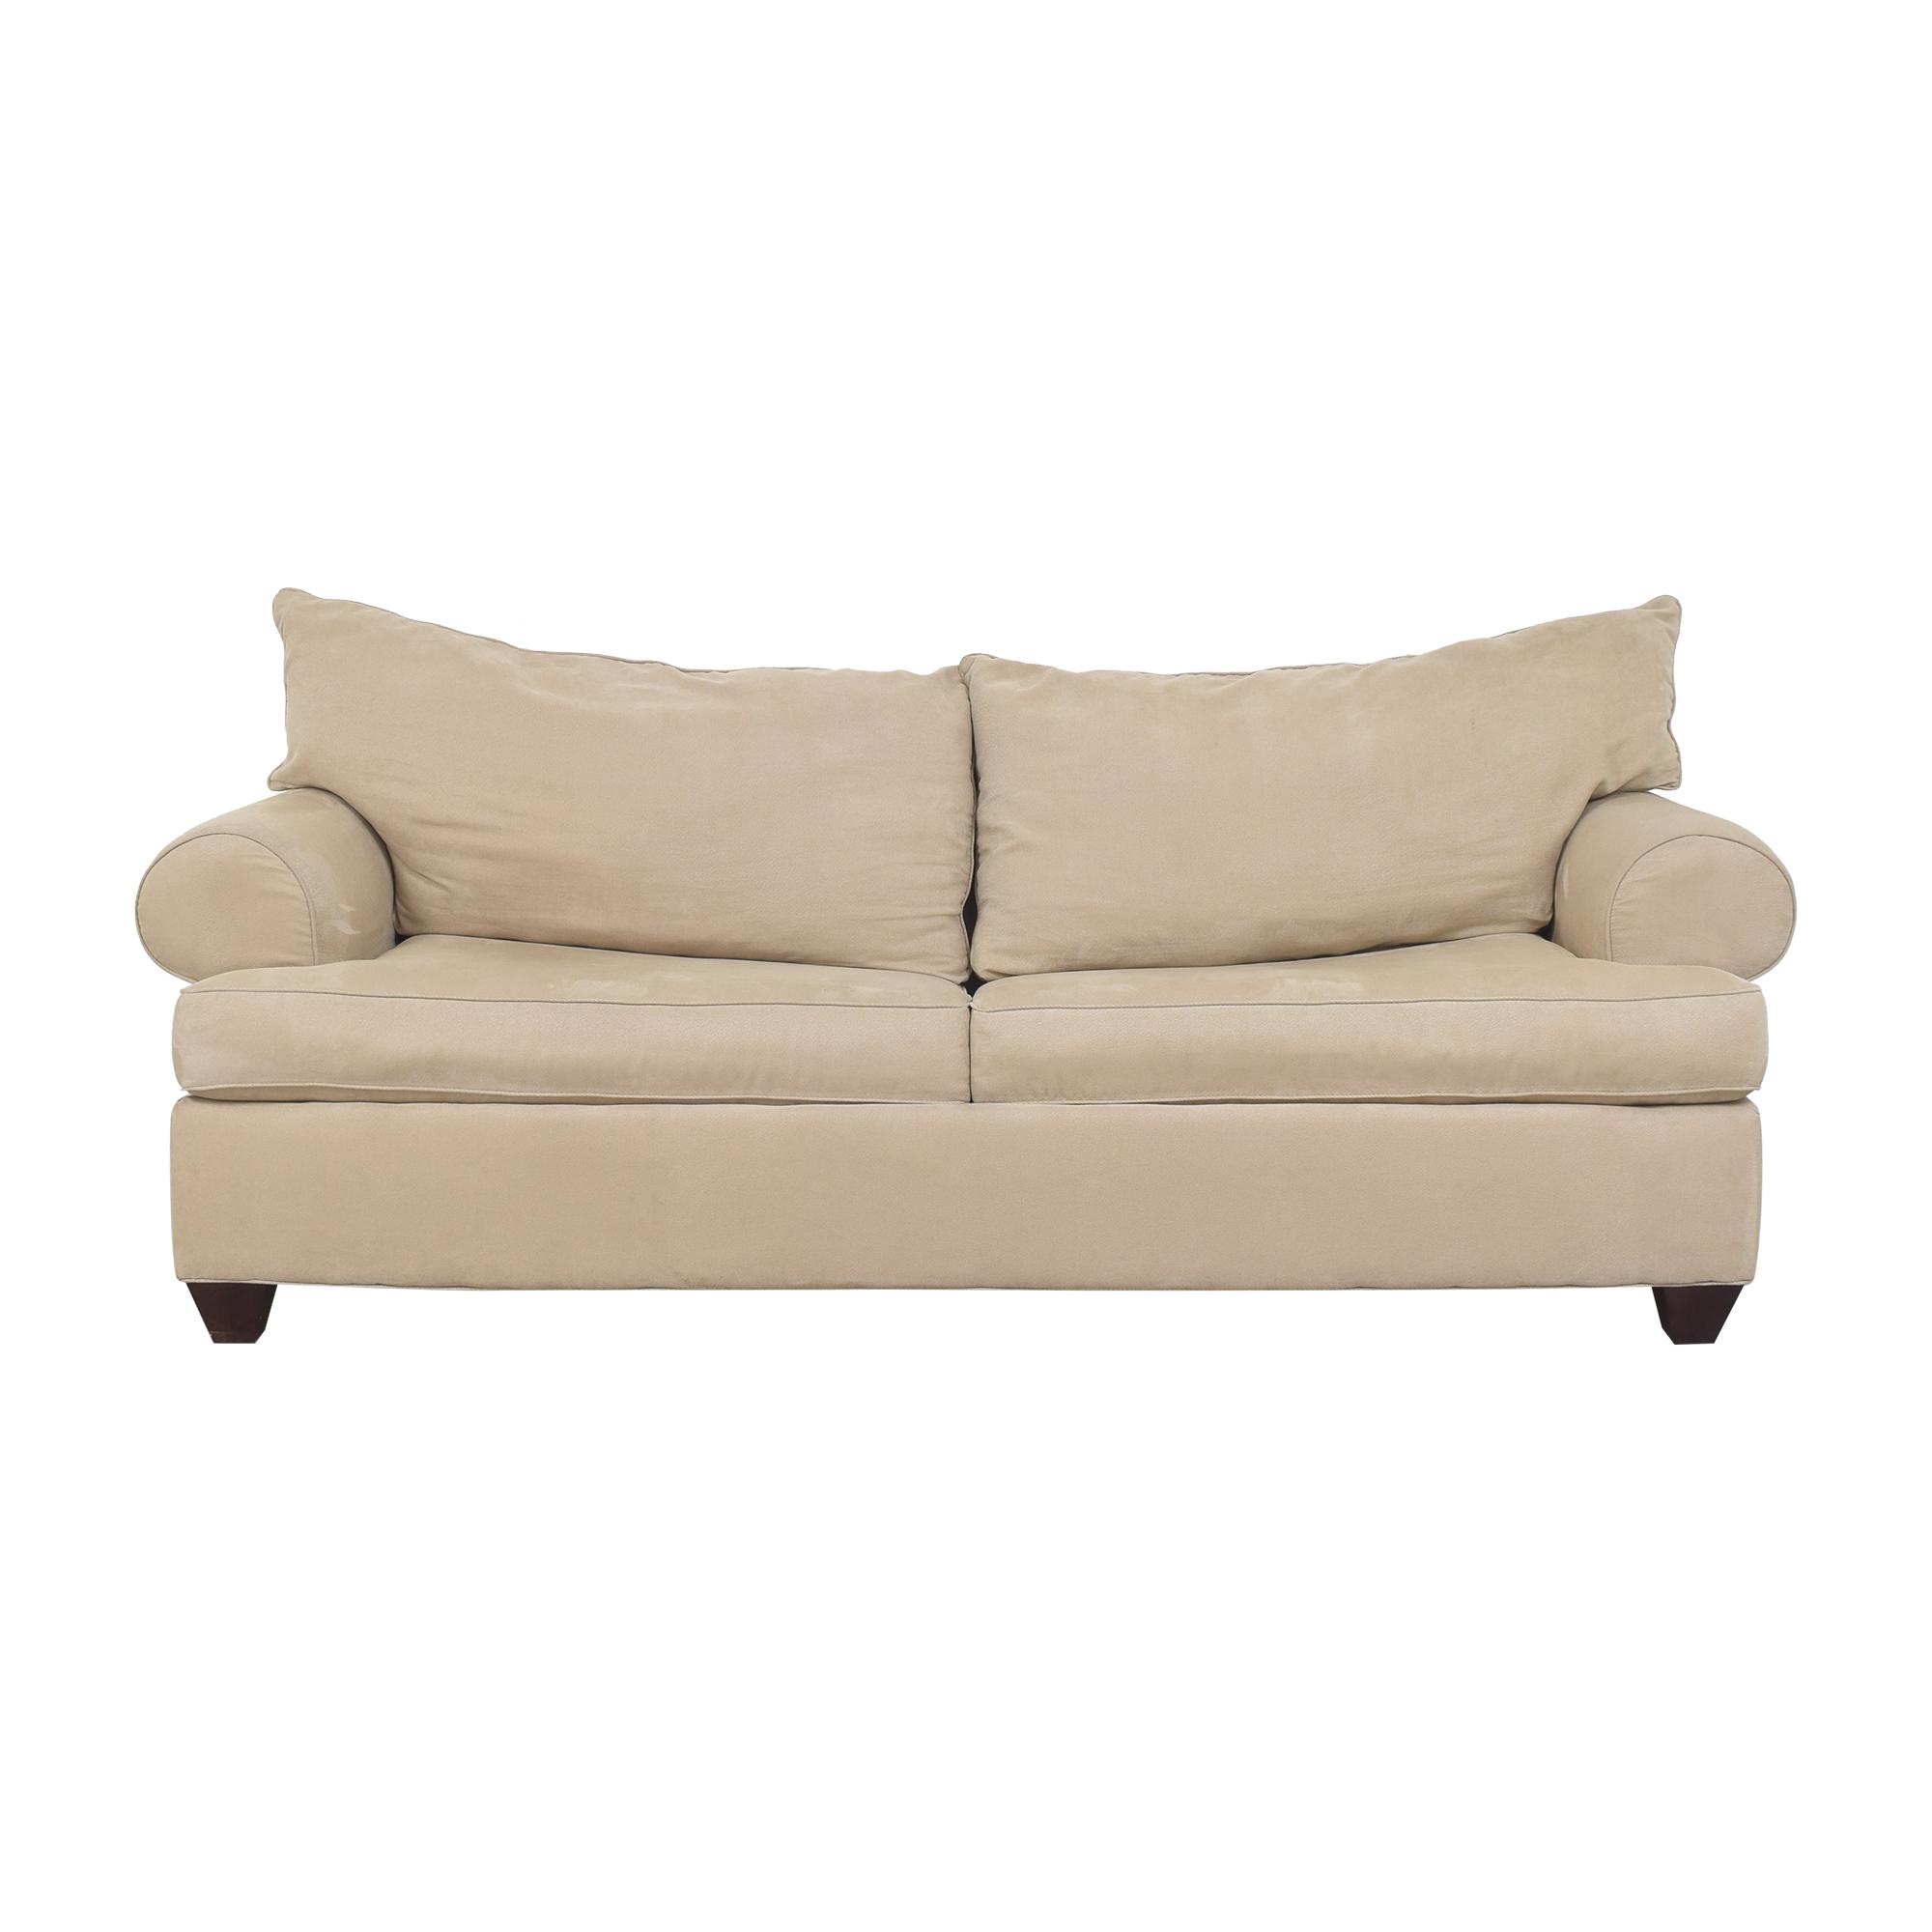 Raymour & Flanigan Raymour & Flanigan Two Cushion Sleeper Sofa for sale